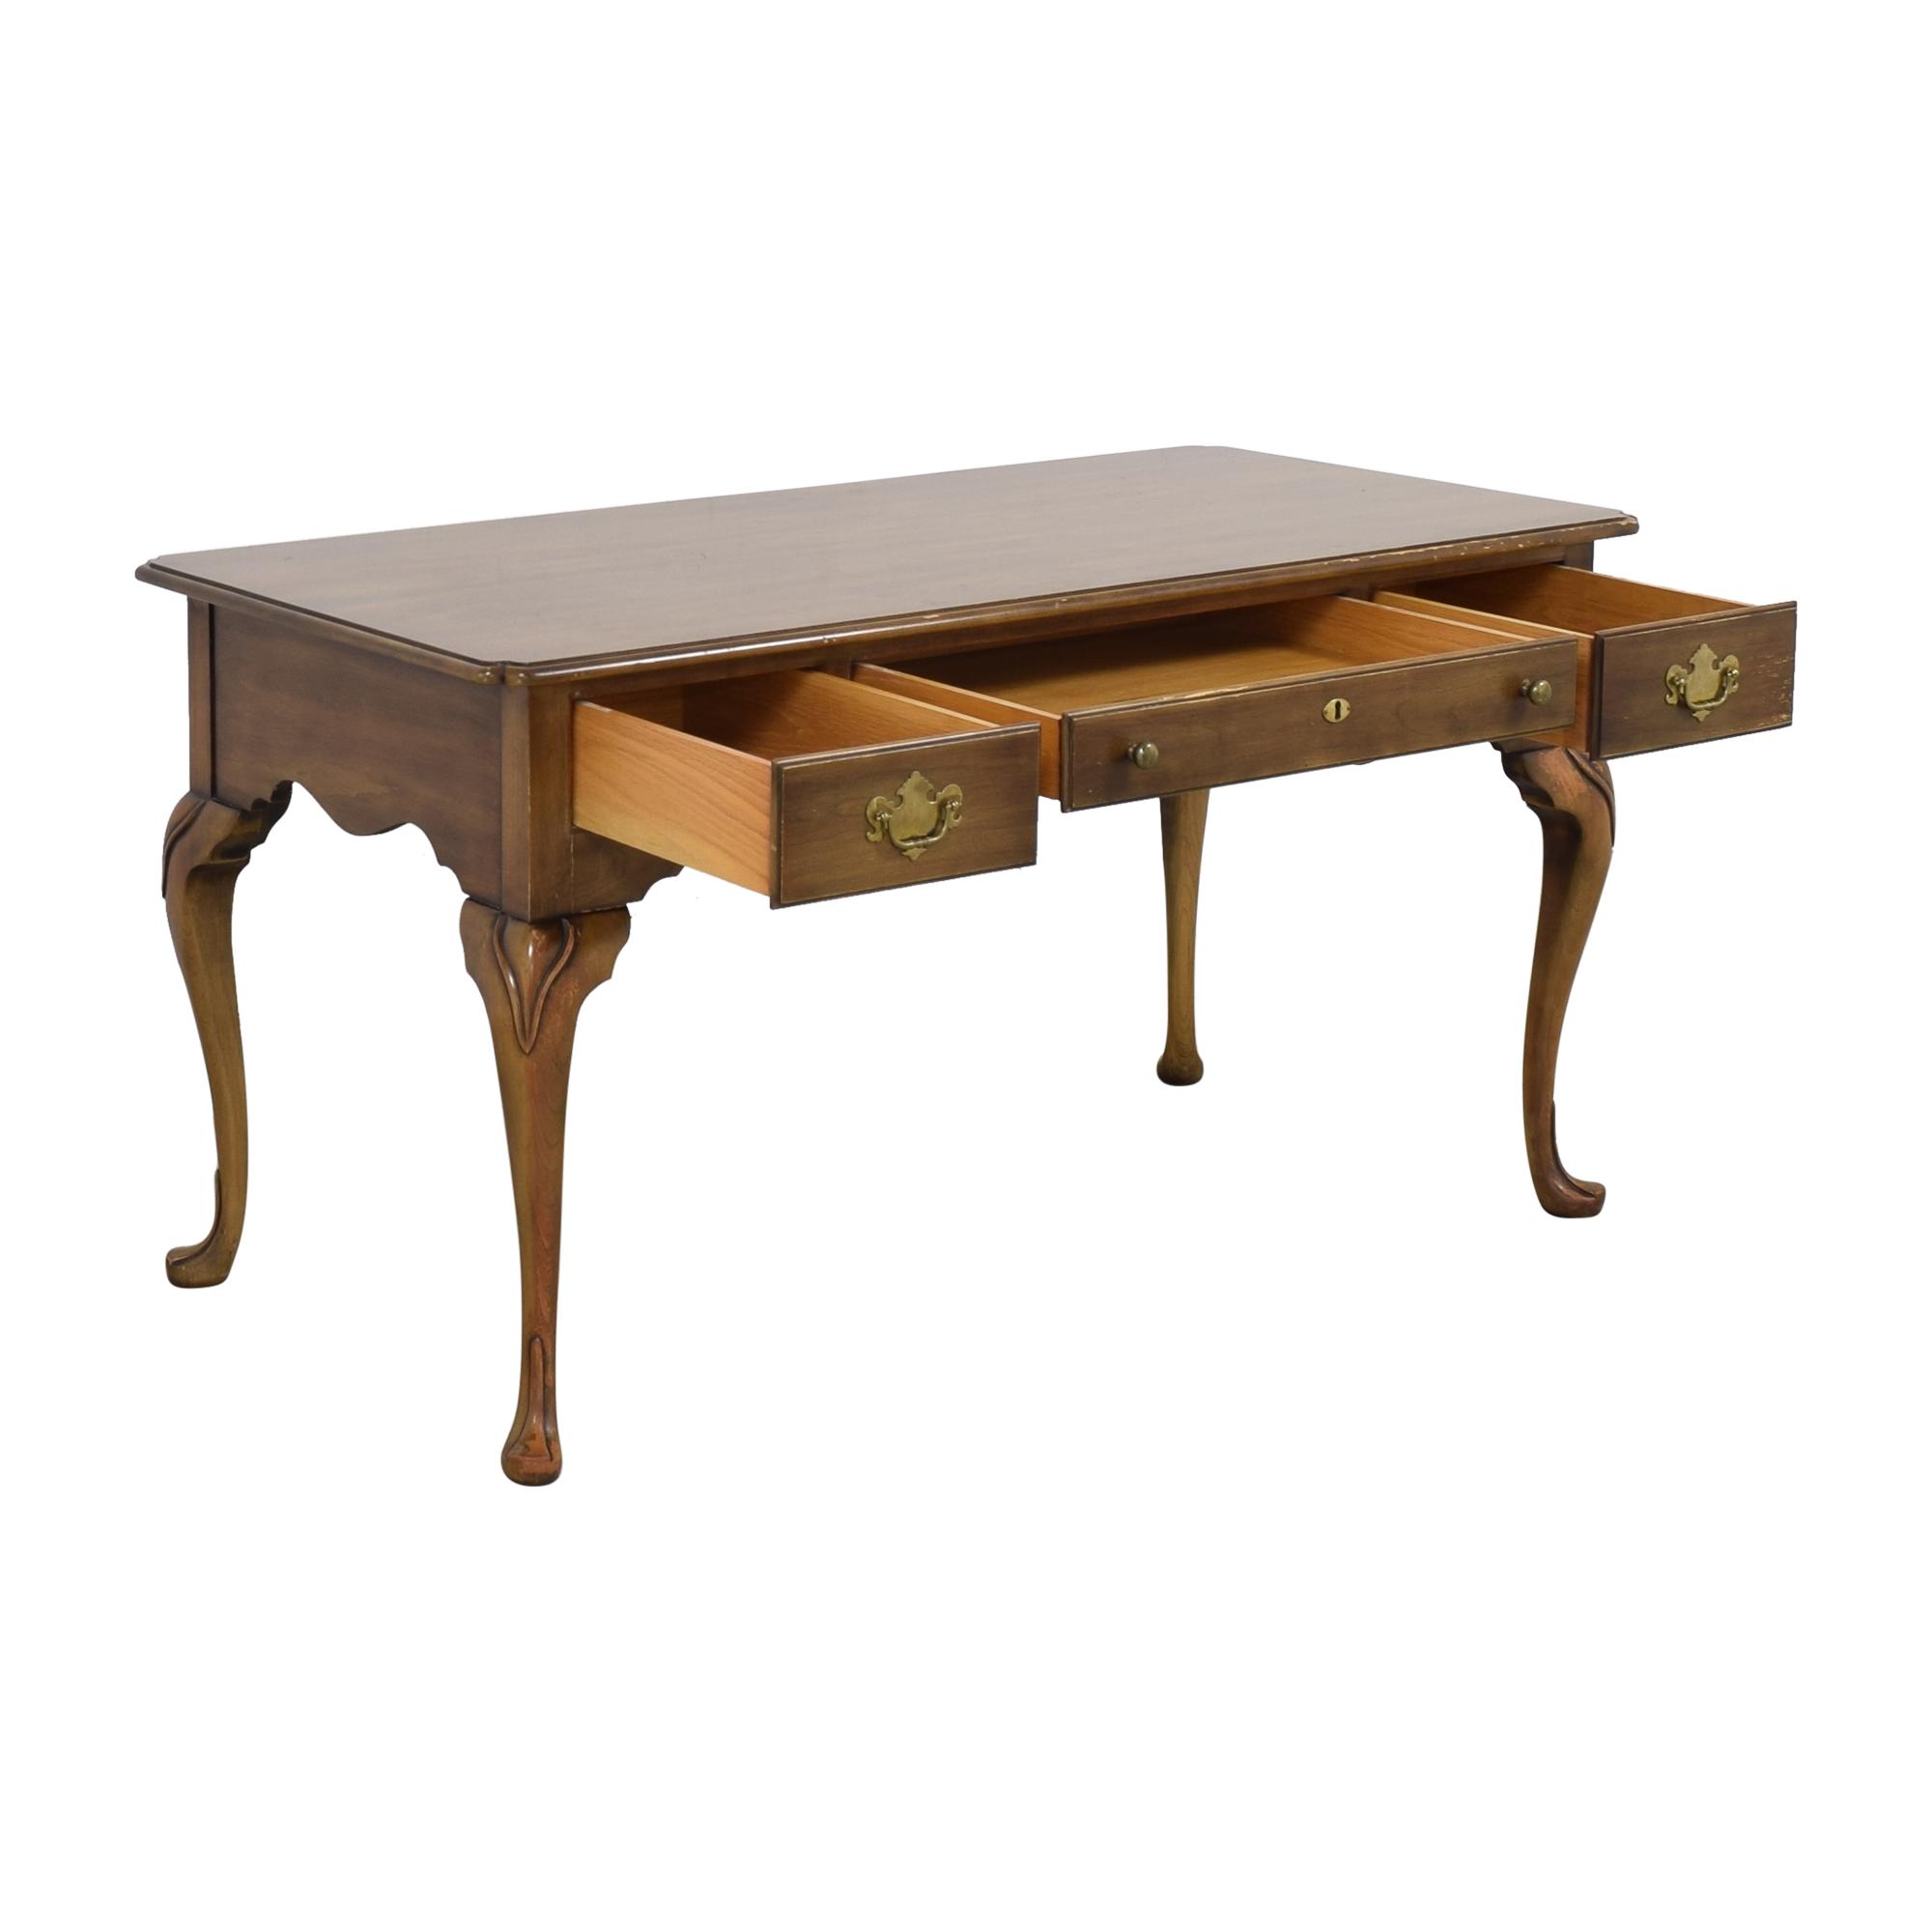 shop Statton Statton Trutype Americana Desk online